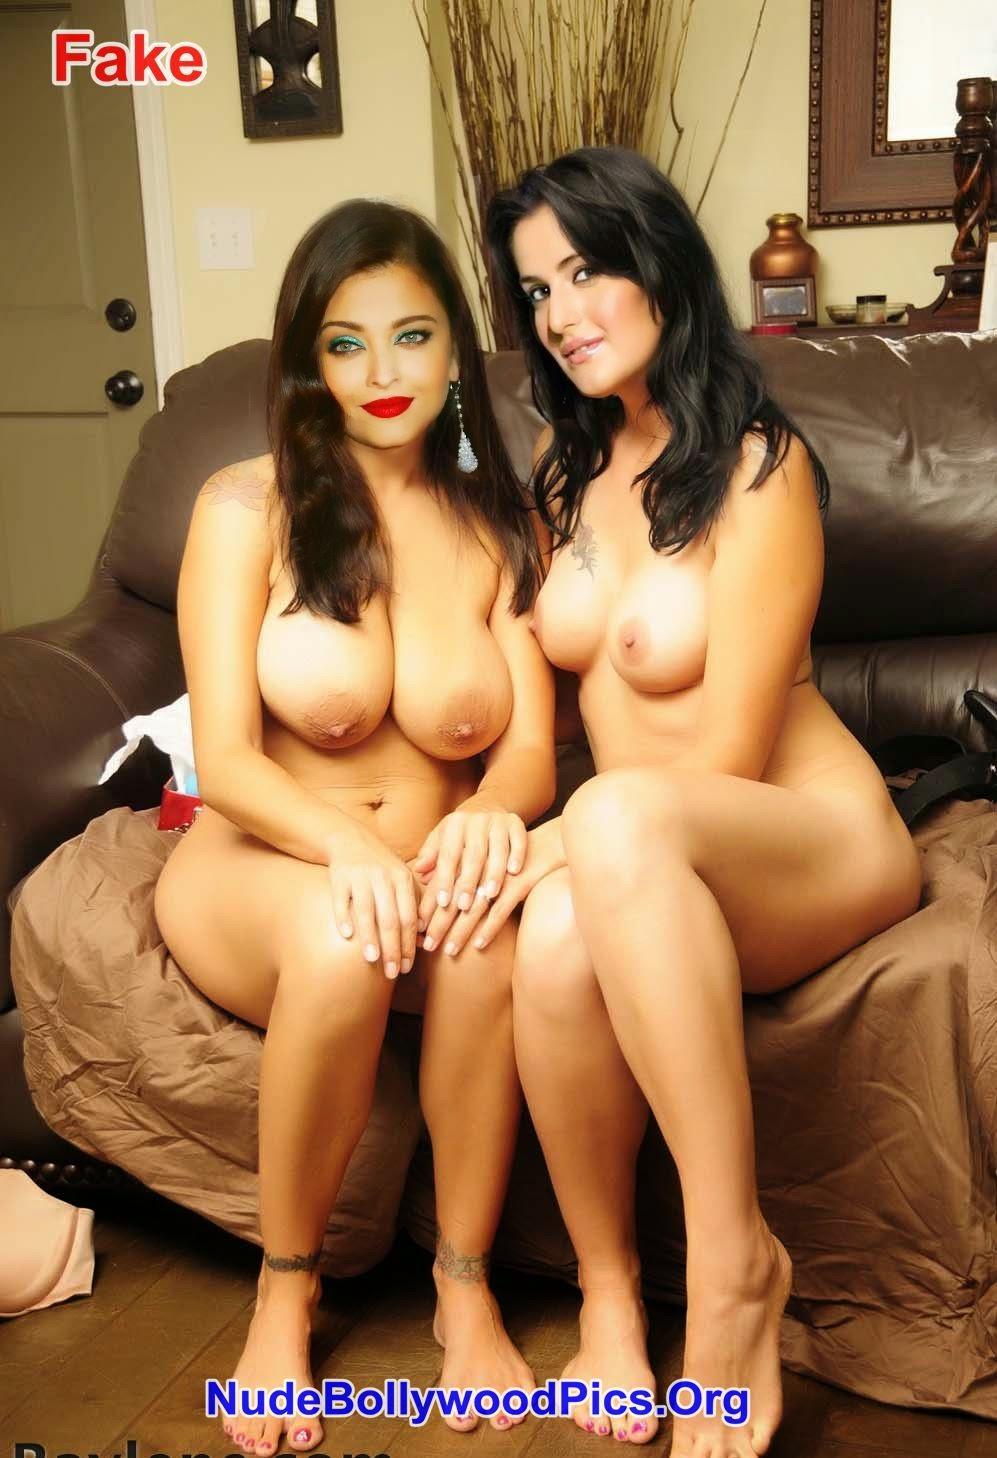 Aishwarya Rai & Katrina Kaif Nude With Big Boobs Lesbian Sex